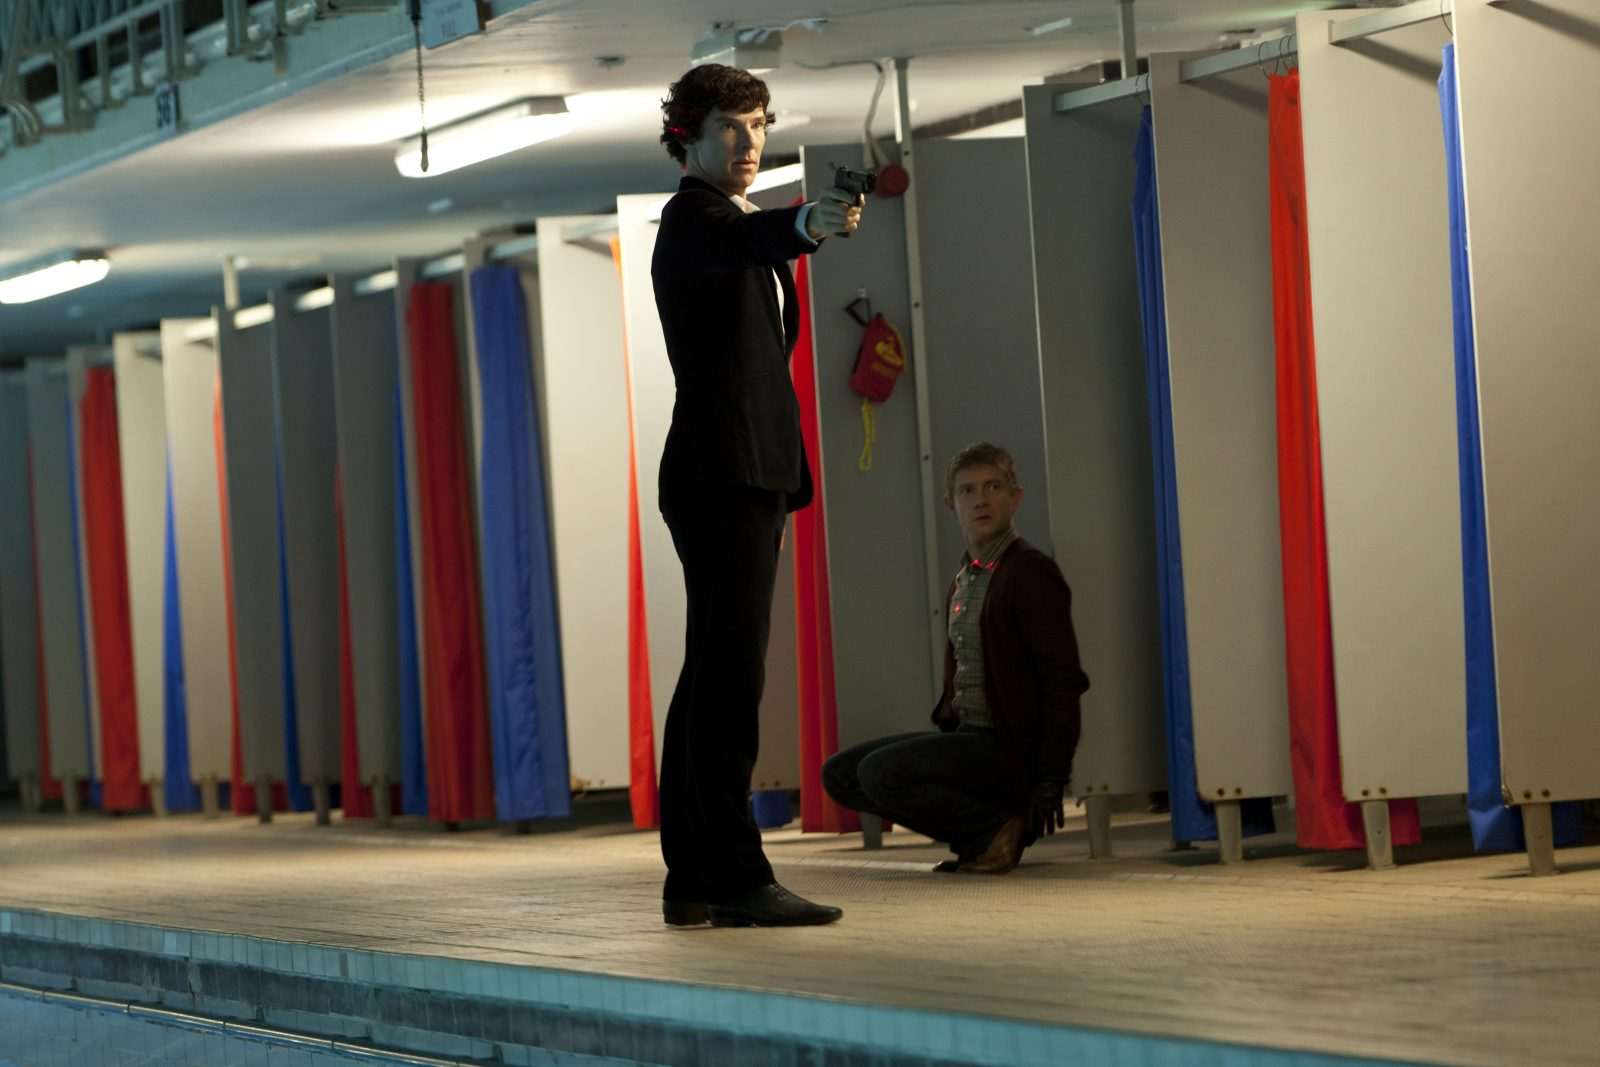 Benedict Cumberbatch and Martin Freeman in 'Sherlock!' (BBC photo)